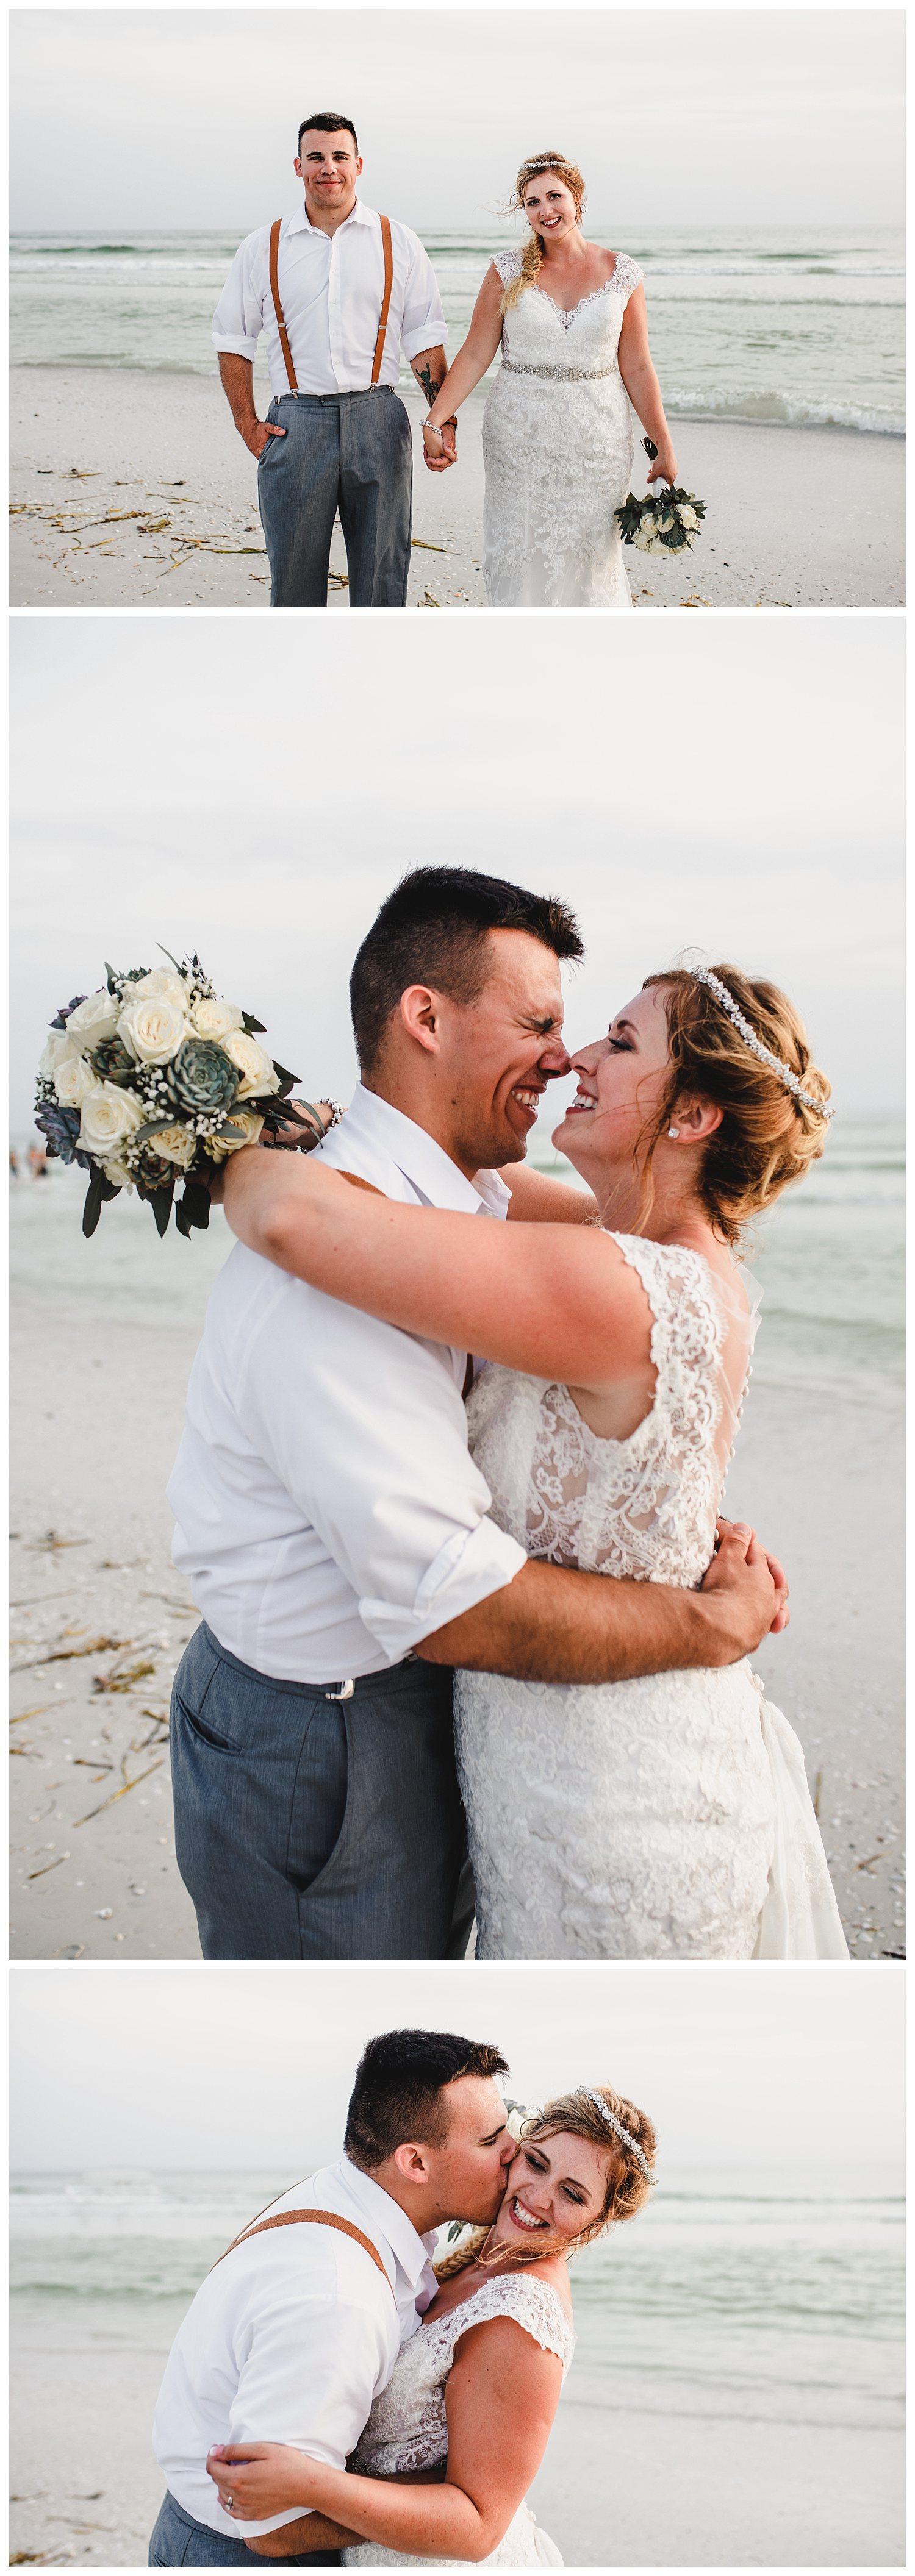 Kelsey_Diane_Photography_Destination_Wedding_Sarasota_Florida_Beach_Wedding_Alex_Austin_0679.jpg